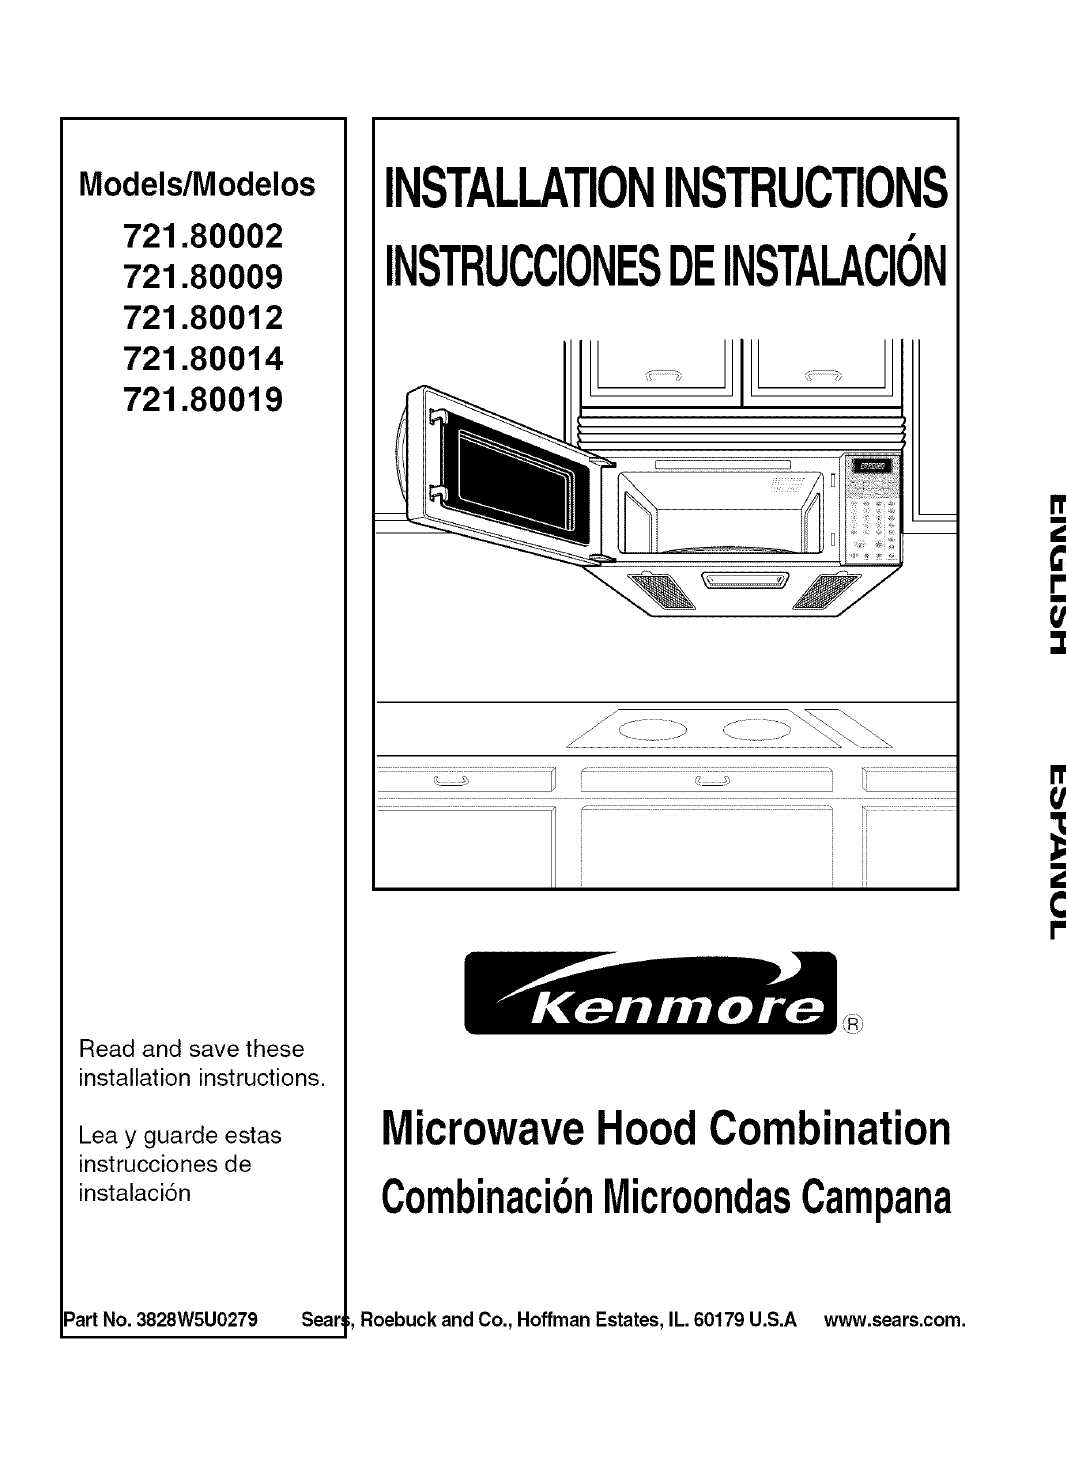 kenmore 72180012400 user manual microwave manuals and guides l0411385 rh usermanual wiki Kenmore Microwave Parts Model Number Kenmore Microwave Parts Model Number